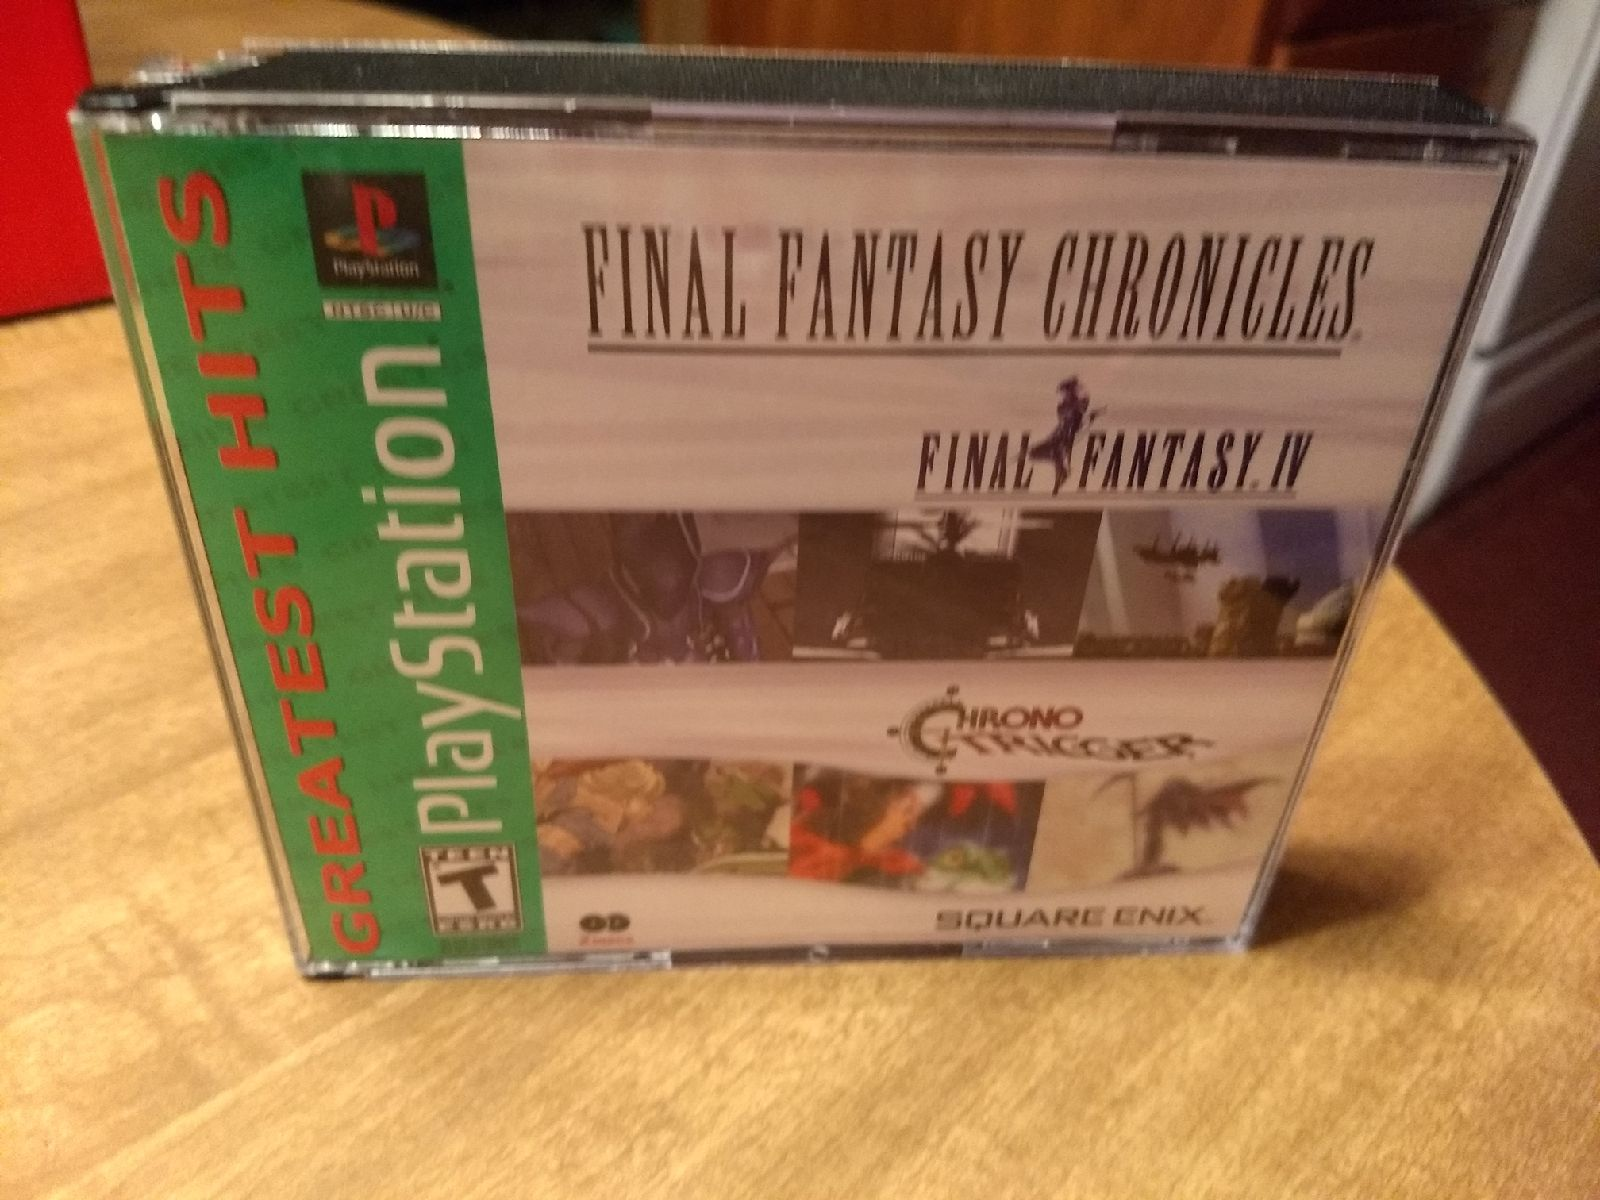 Final Fantasy Chronicles PlayStation 1